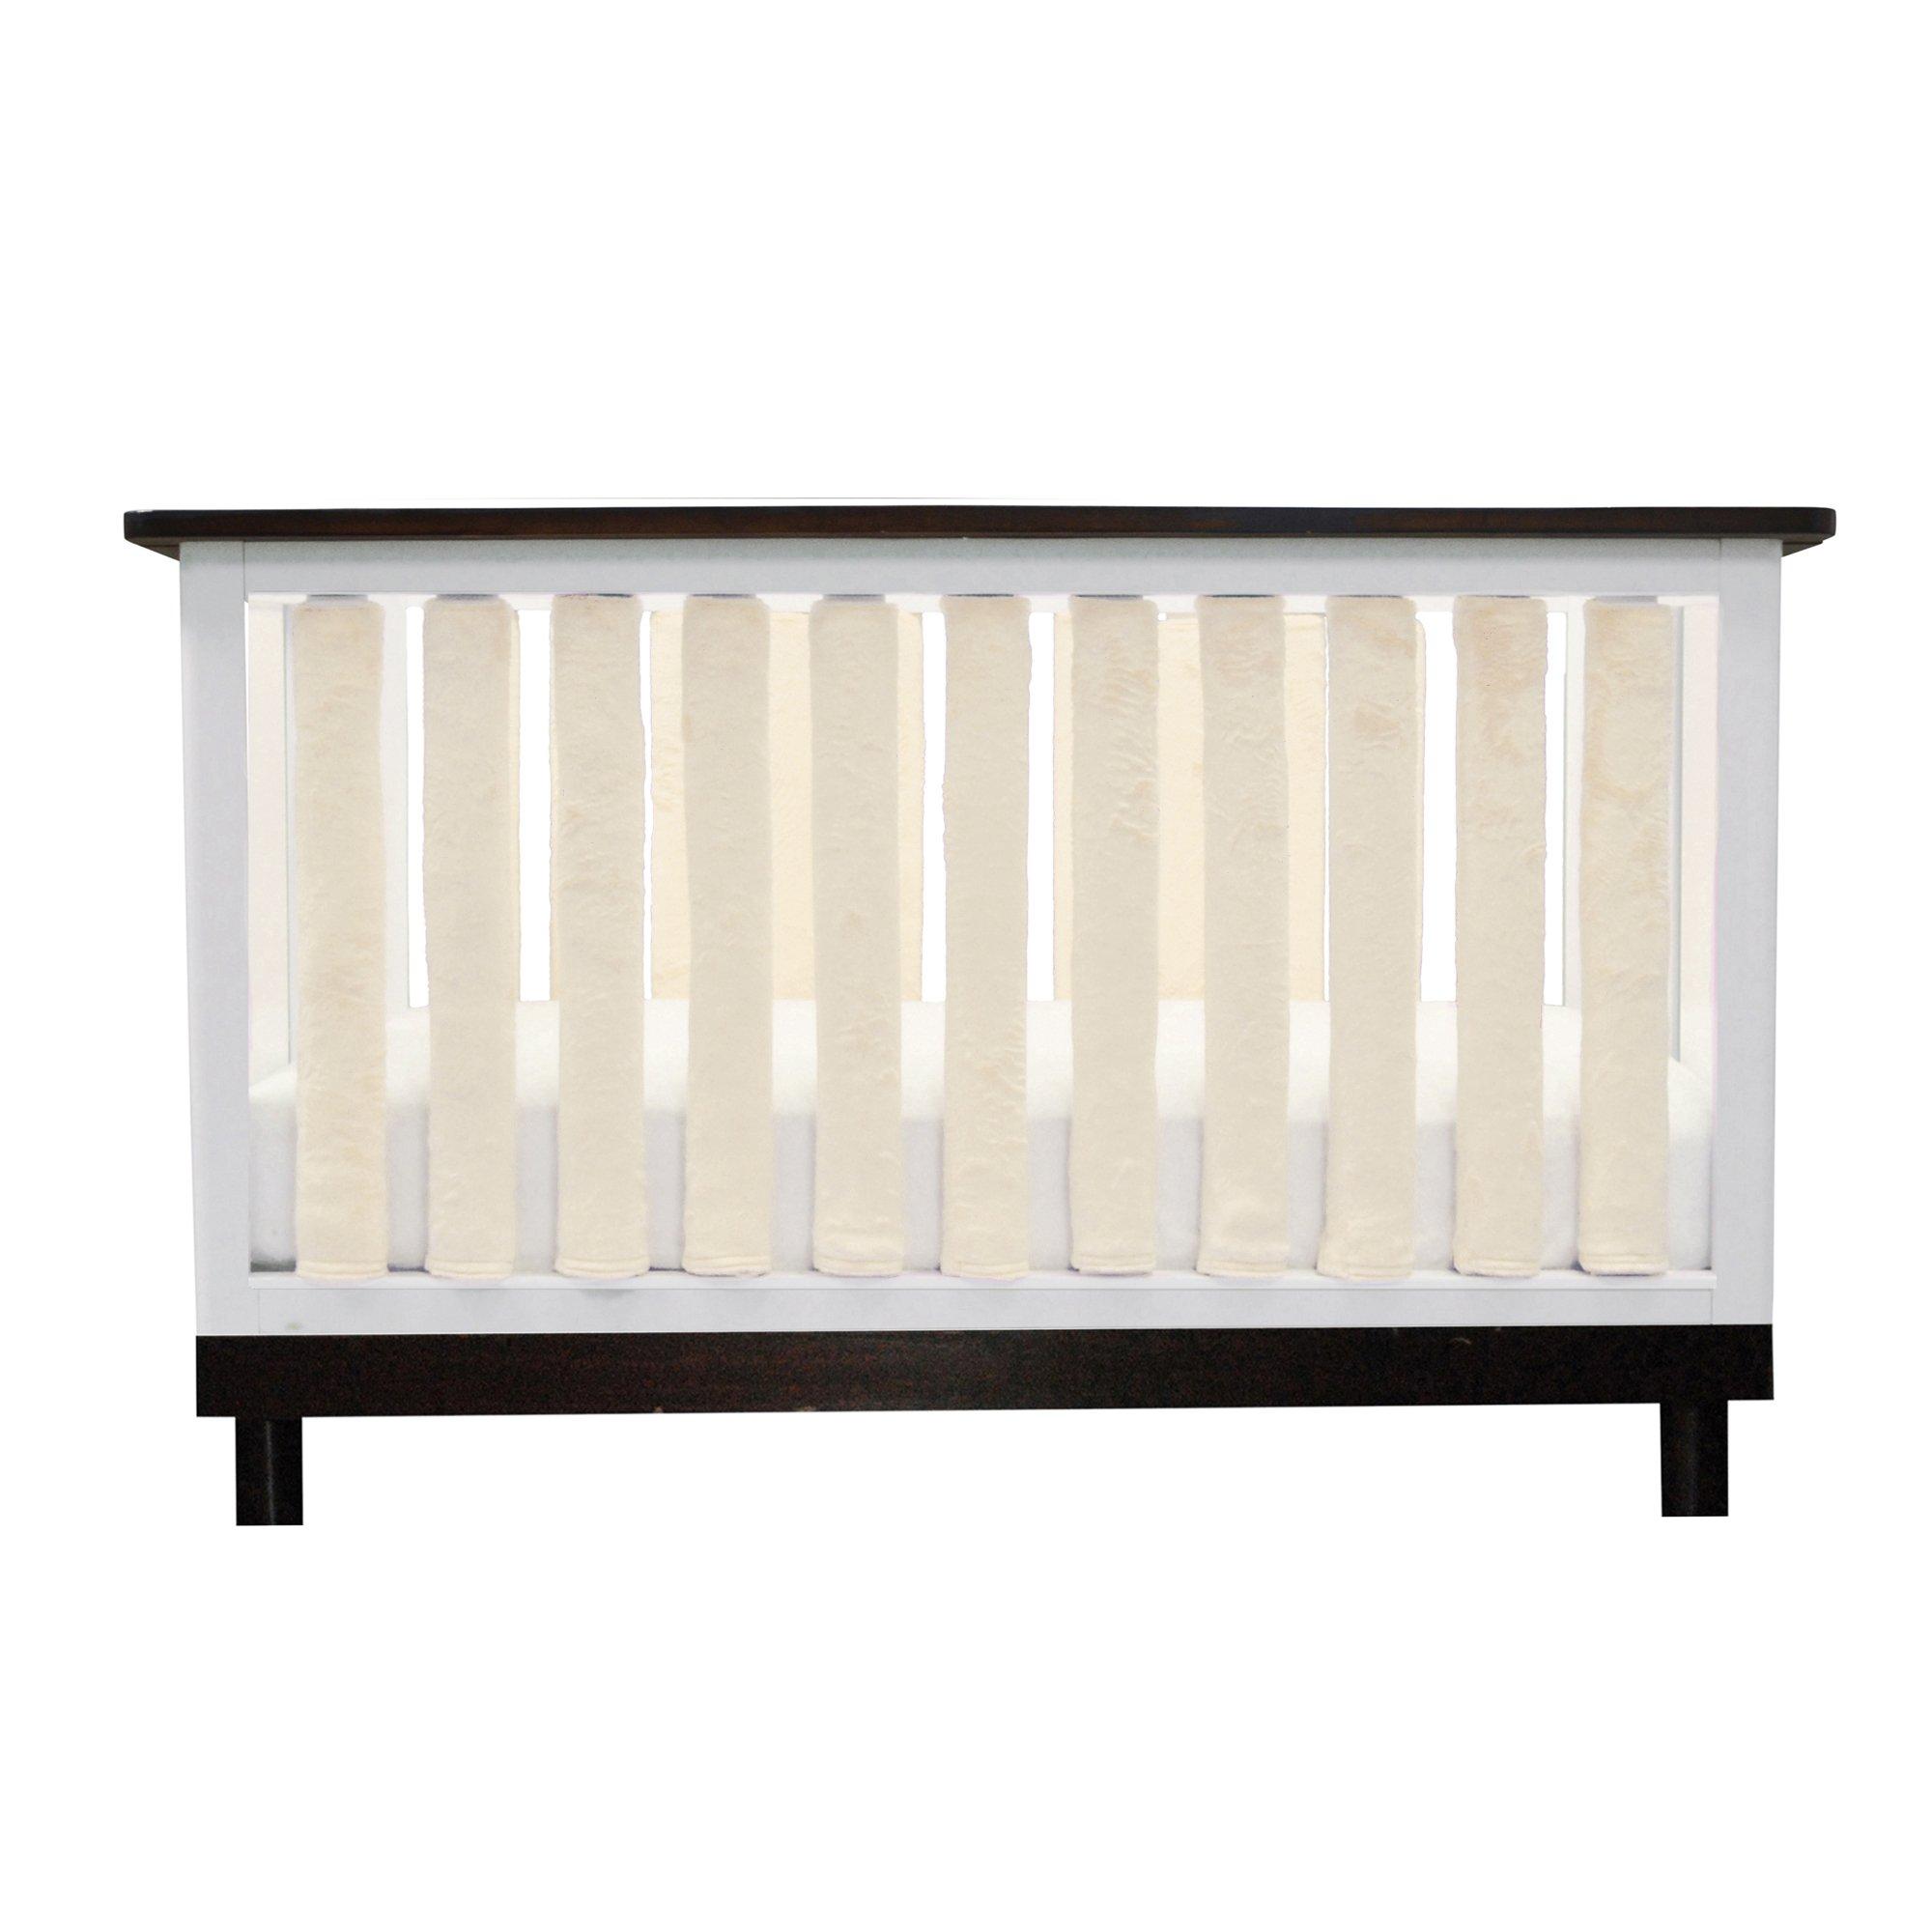 Go Mama Go 24 Piece Pure Safety Vertical Crib Liners, Cream Minky by Go Mama Go